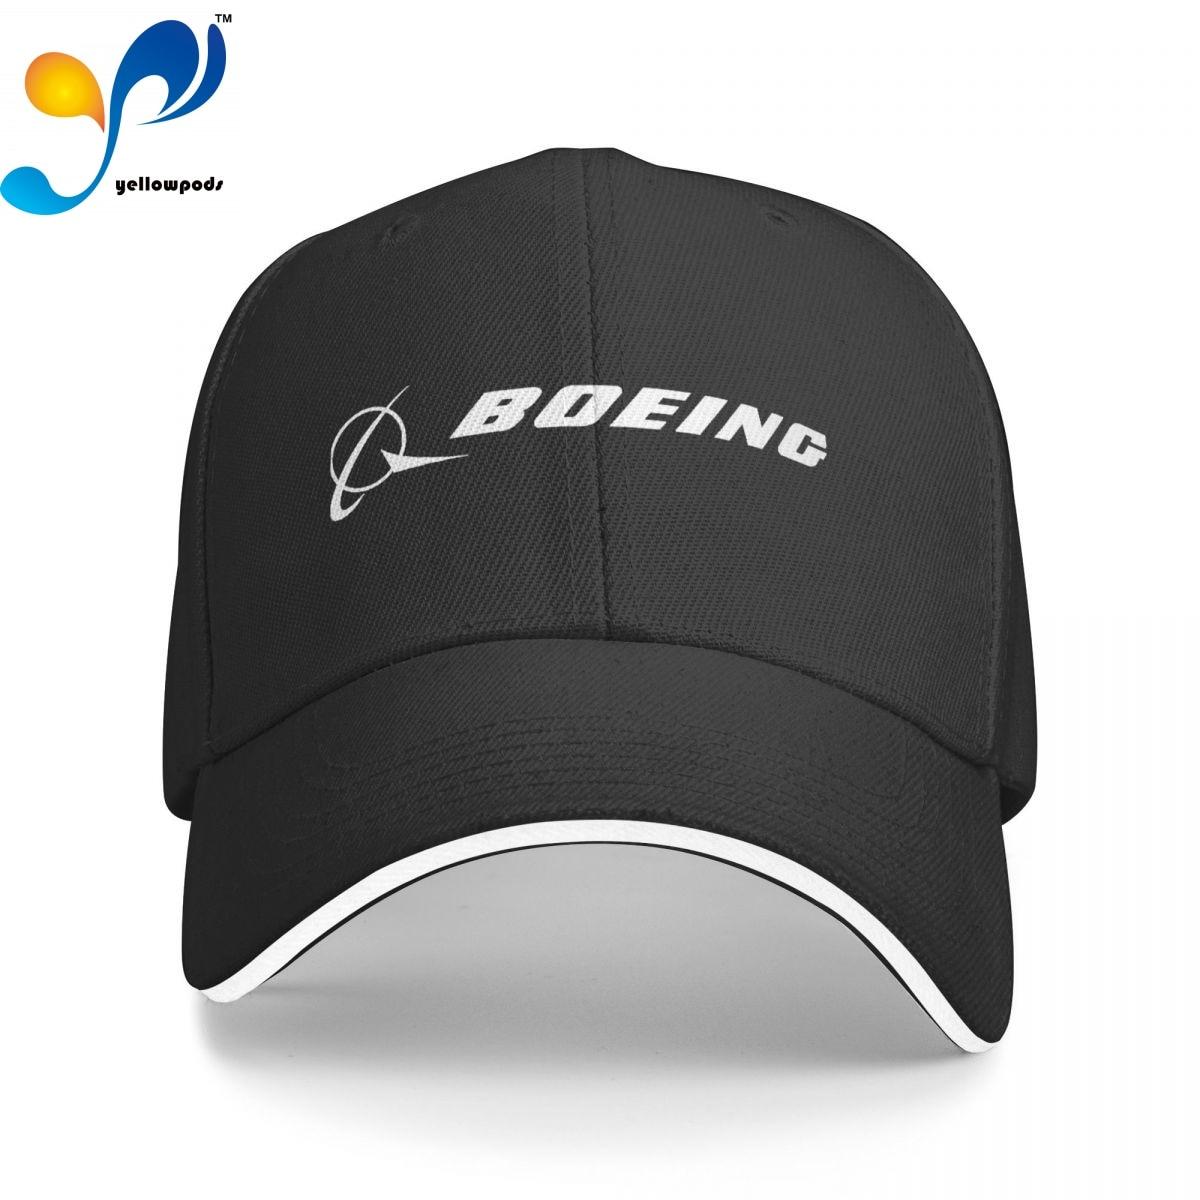 Панама Боинг 787, бейсболка Боинг, регулируемые бейсболки унисекс, шапки с клапаном для мужчин и женщин, мужские